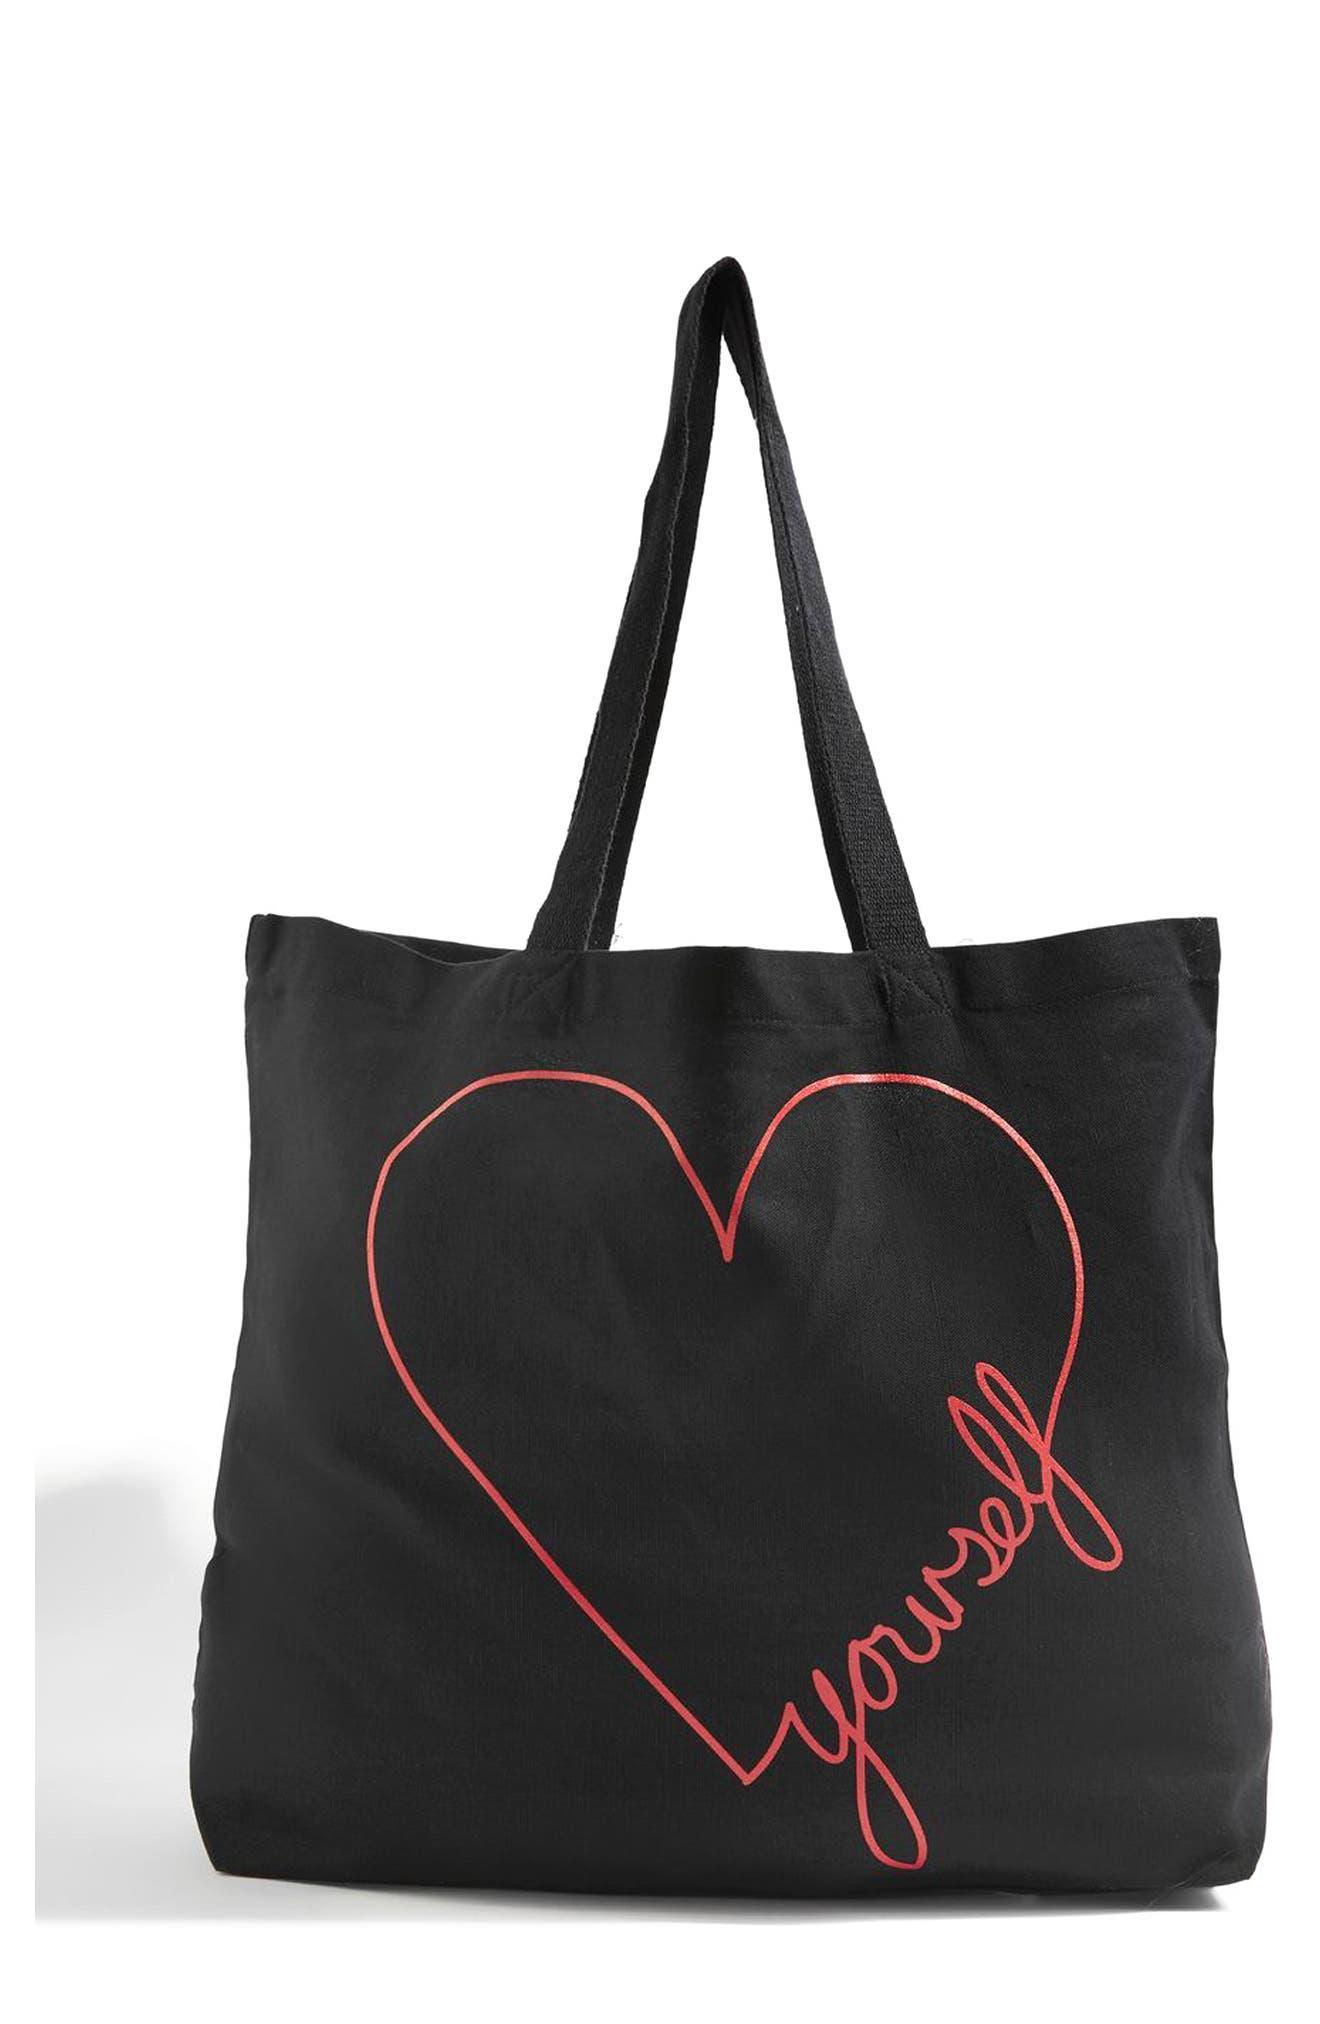 Love Yourself Canvas Tote Bag,                             Main thumbnail 1, color,                             Black Multi